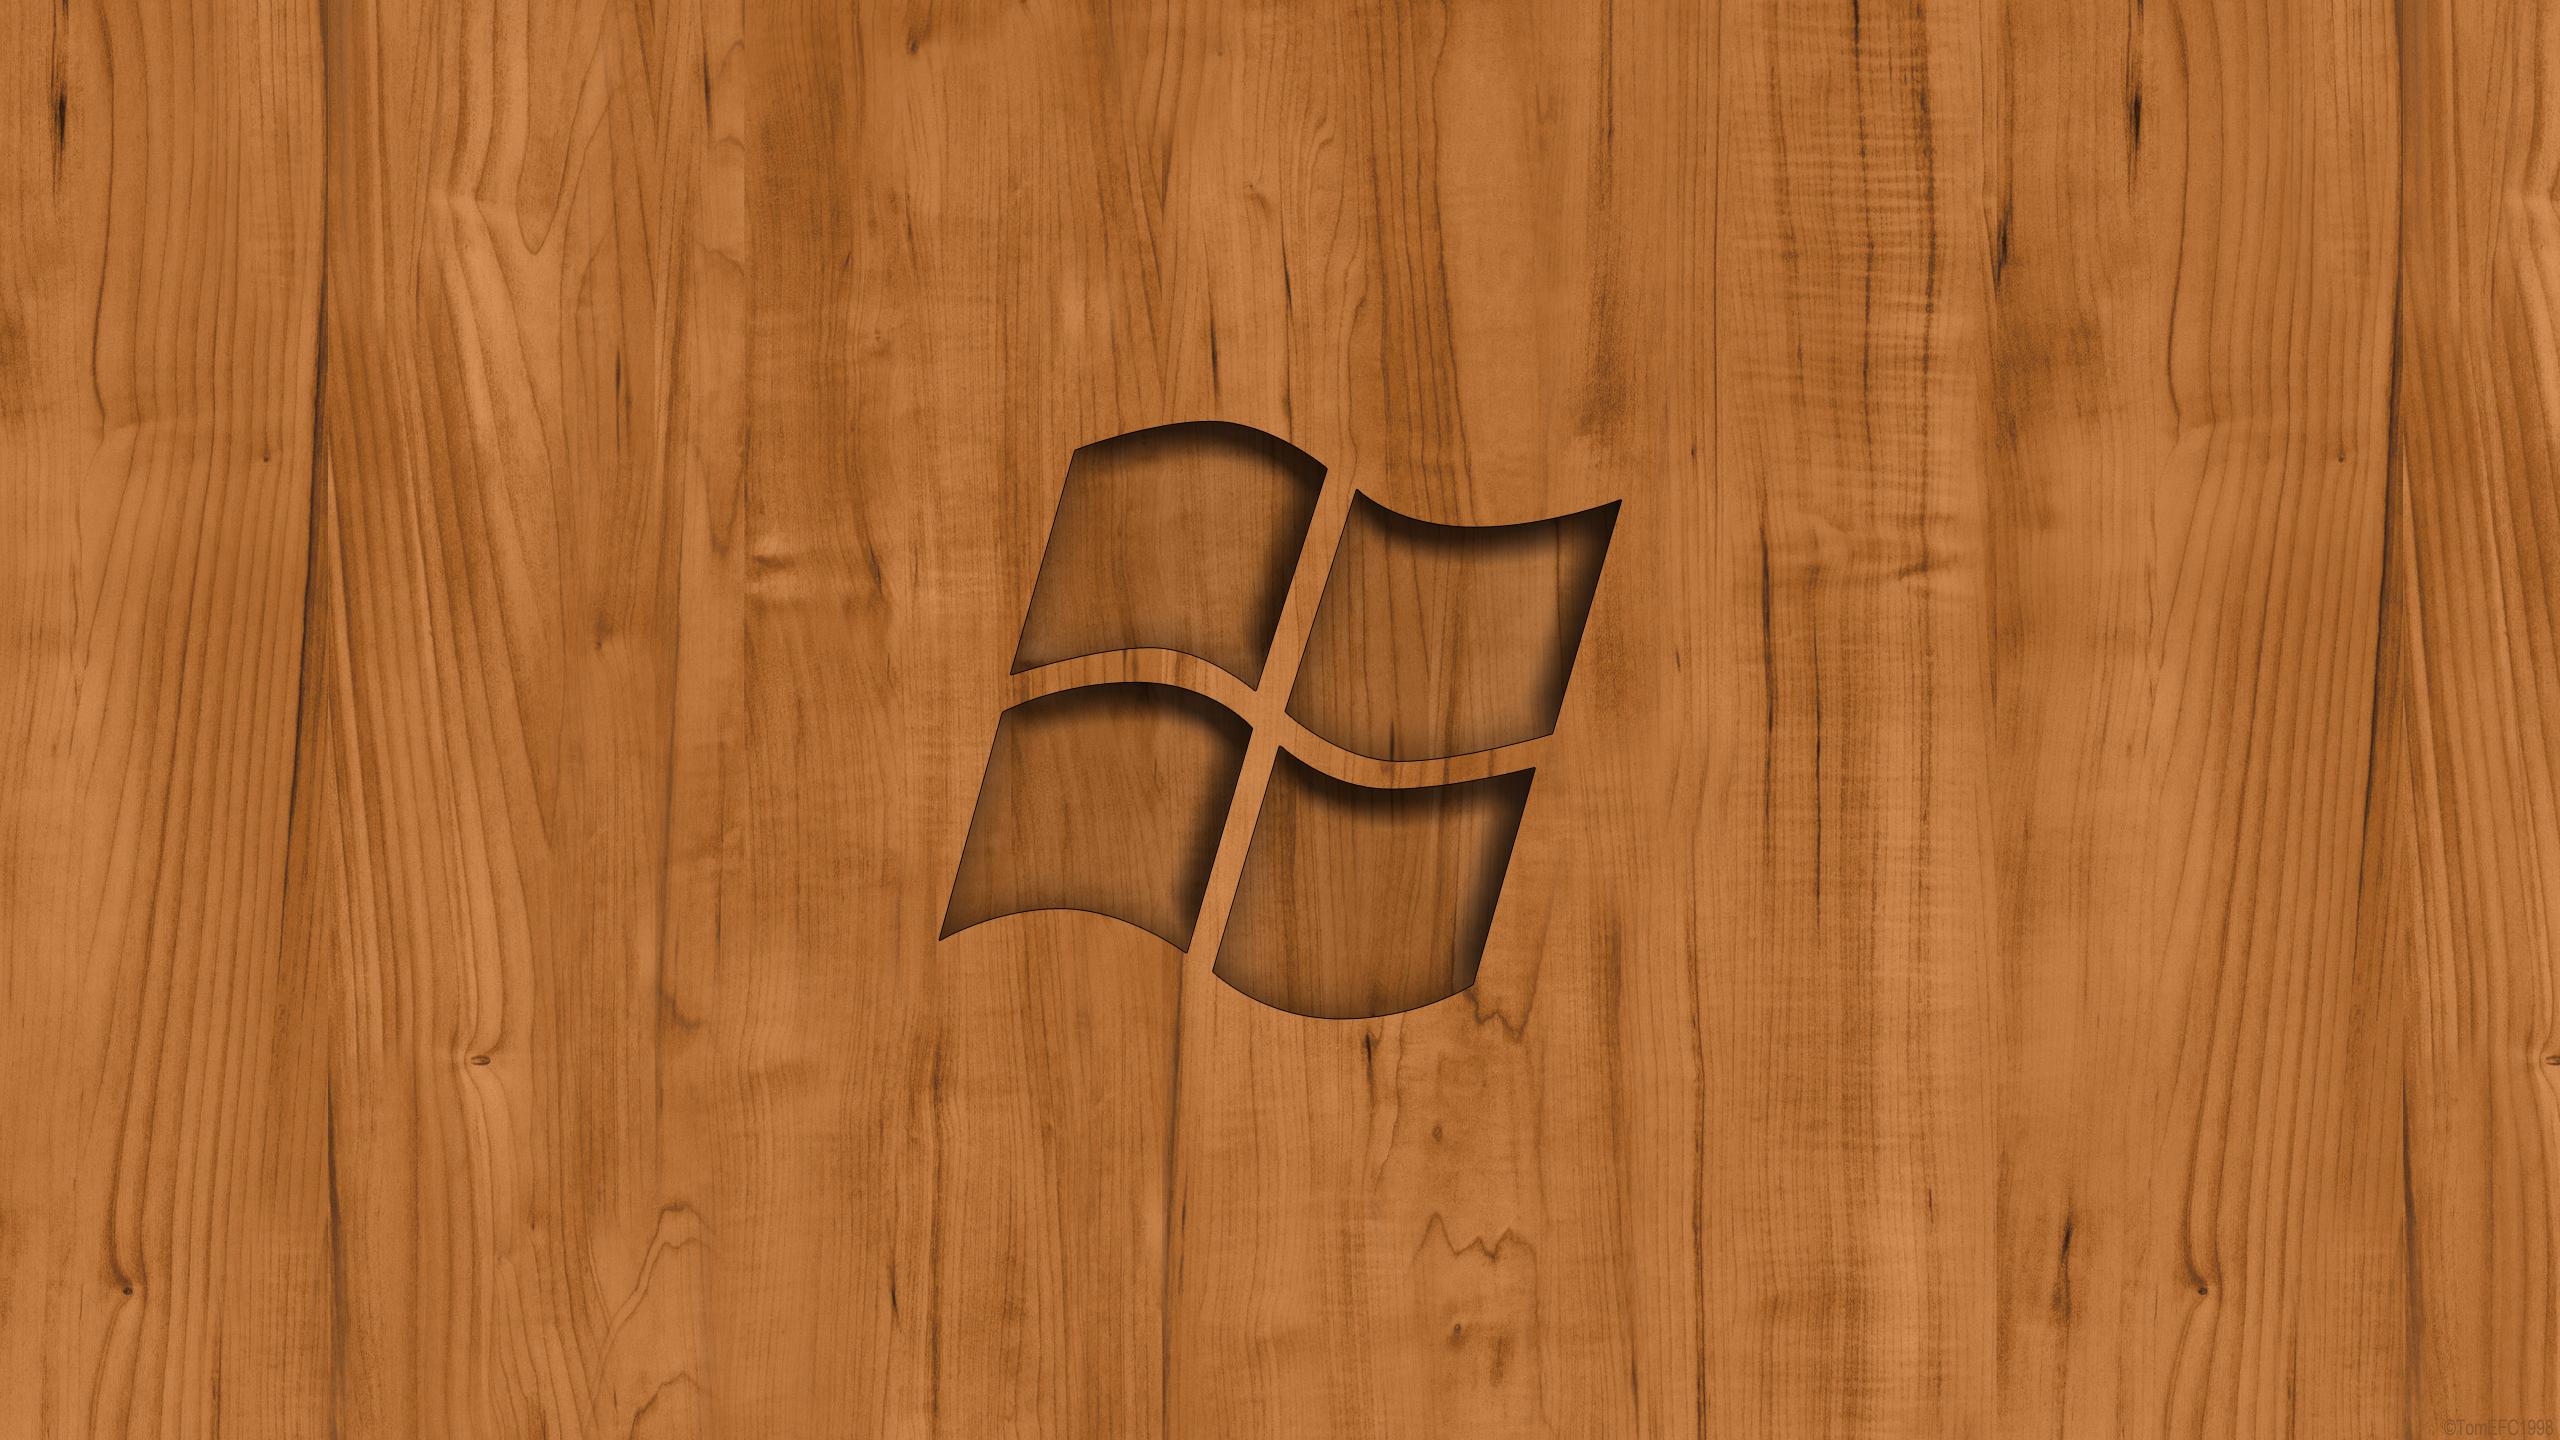 Windows Wood Wallpaper by TomEFC98 on DeviantArt